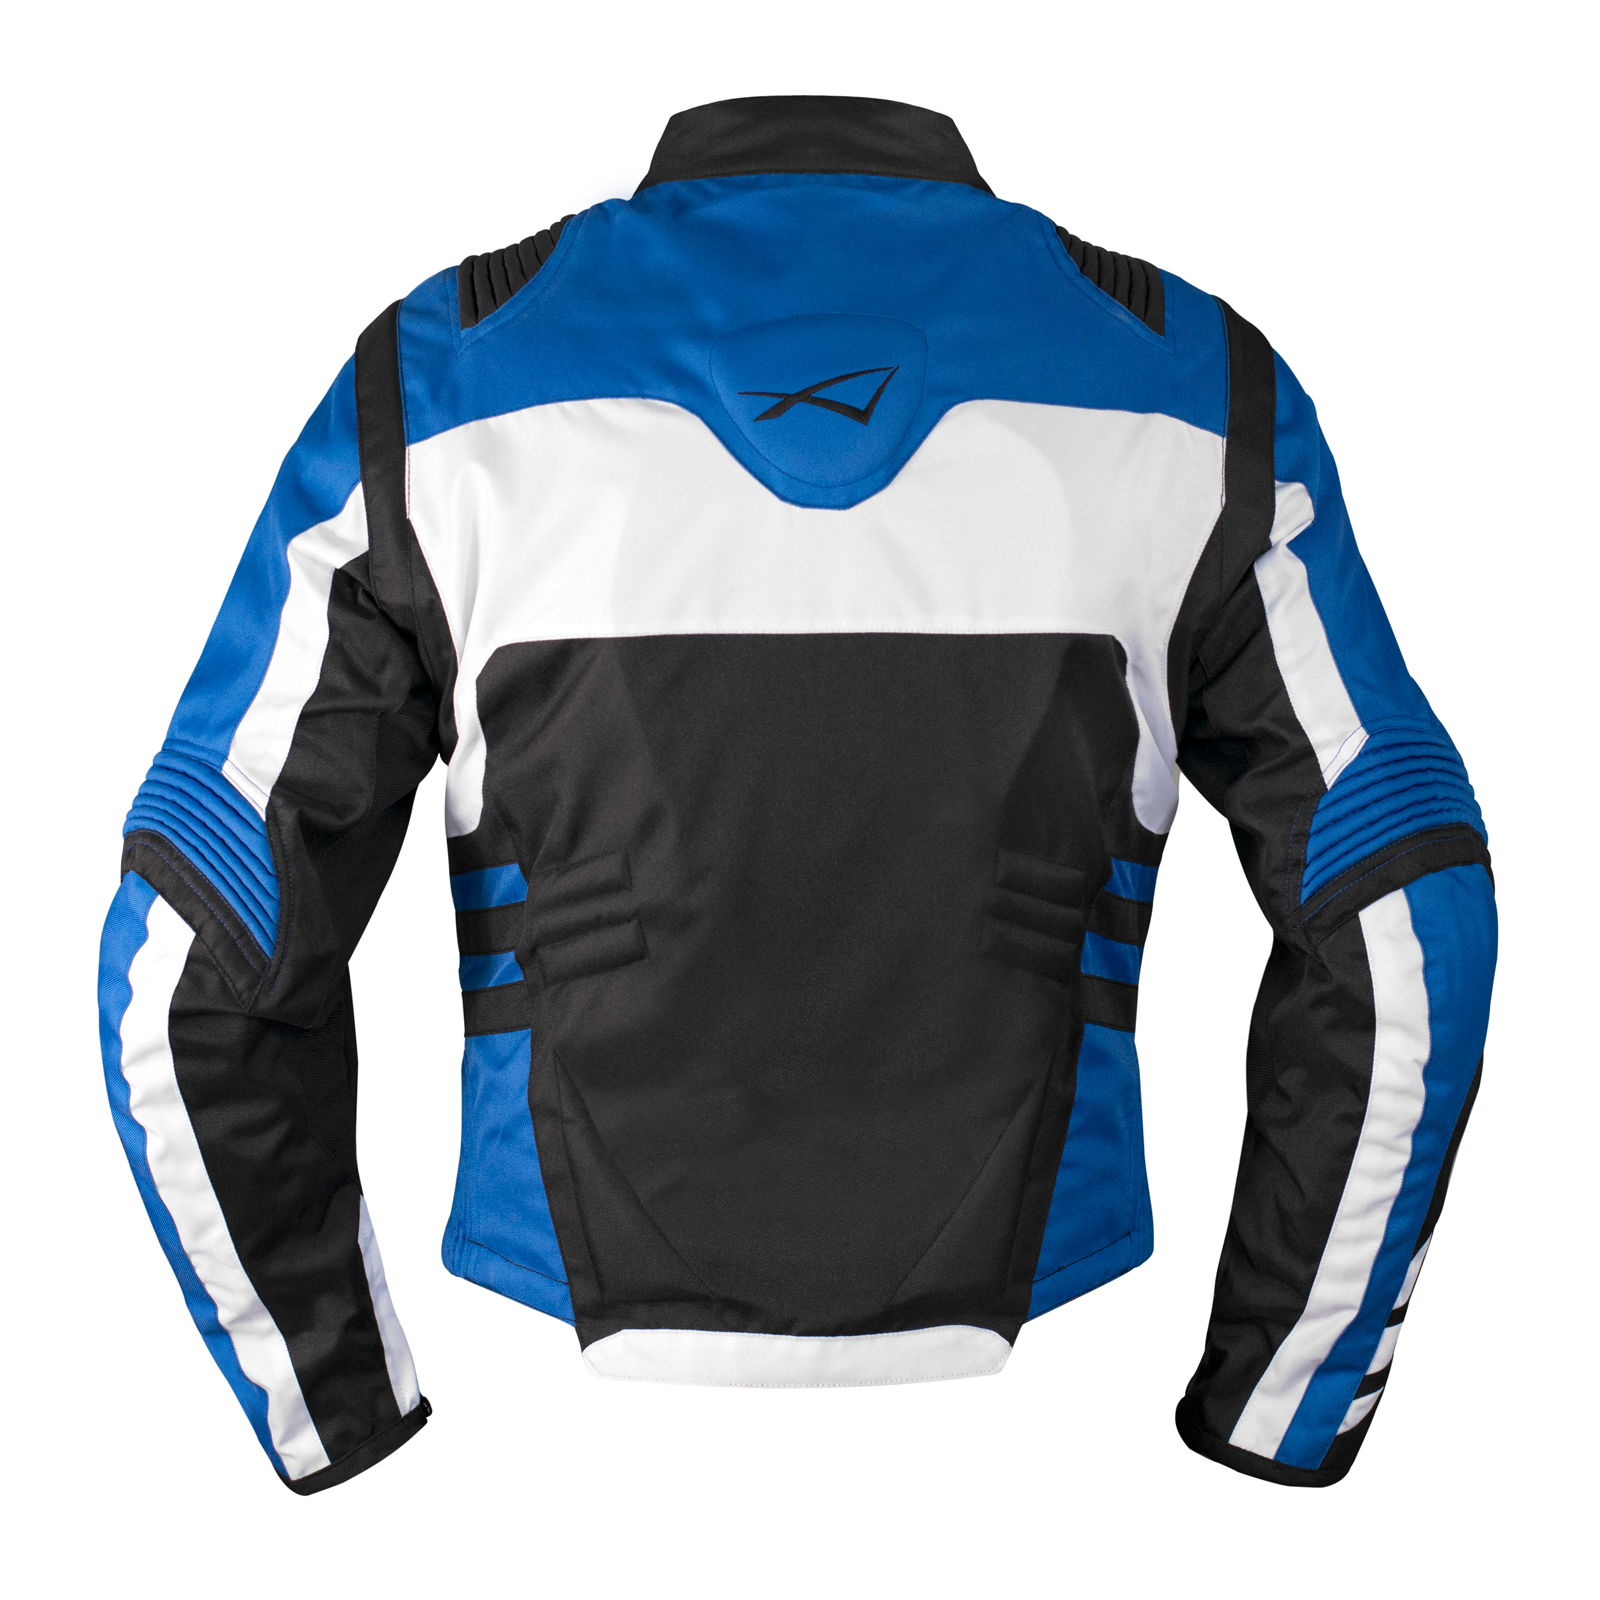 Blouson-Tissu-Haute-Resistance-Protections-Motard-Moto-Touring-Ete miniature 13